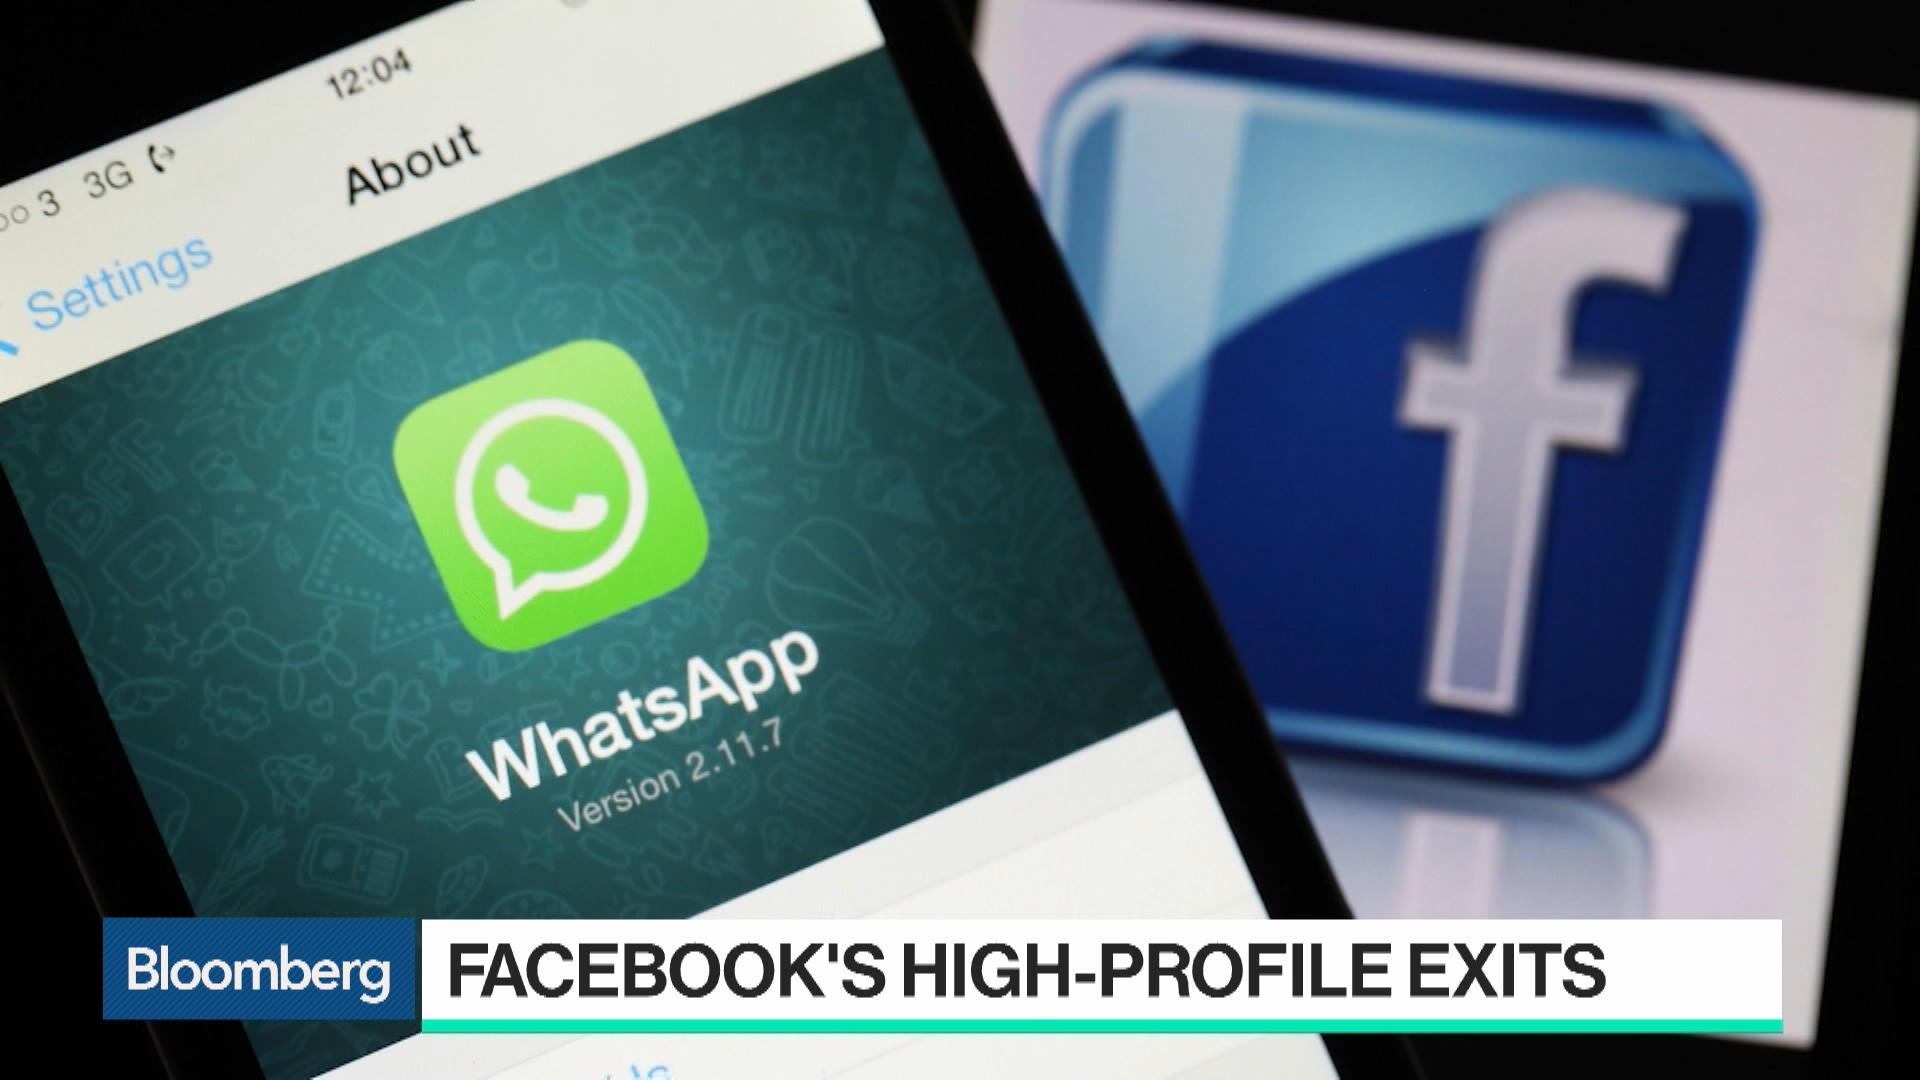 Facebook's Problems Are 'Quite Grave,' Techonomy's Kirkpatrick Says